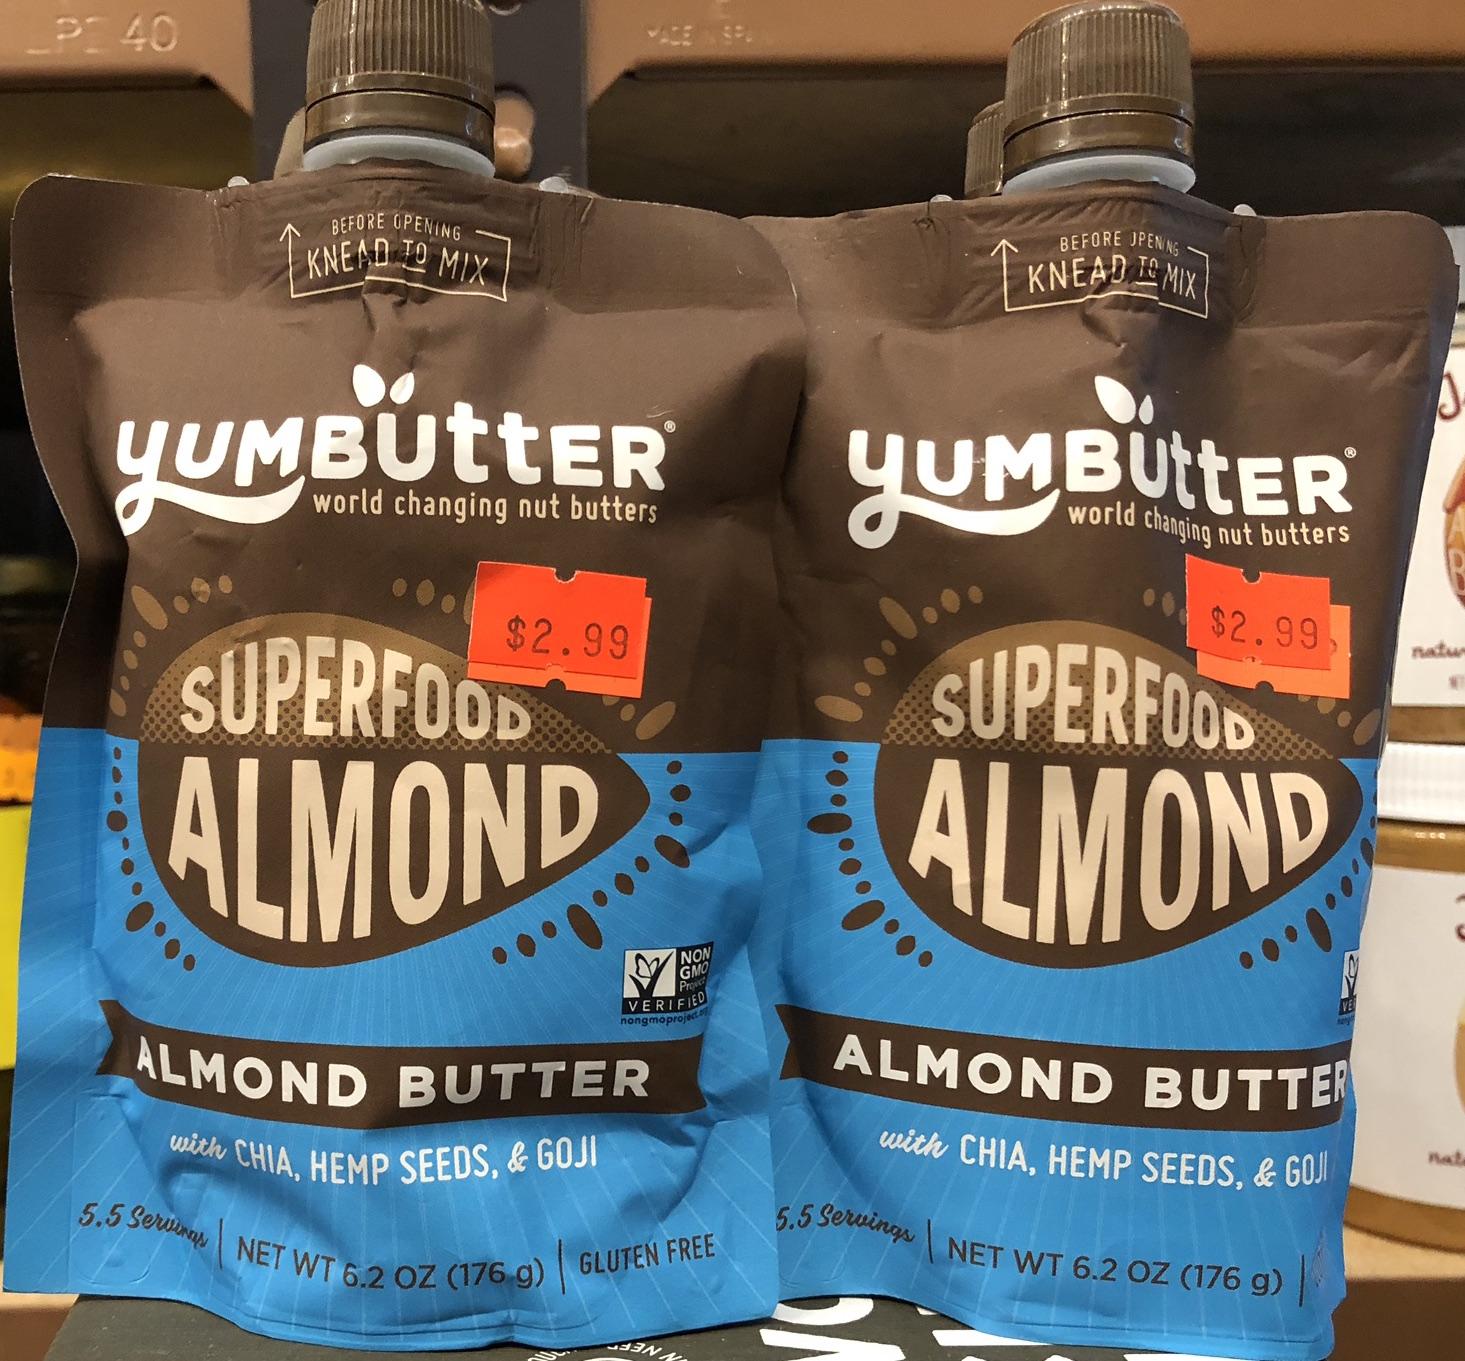 Yumbutter Superfood Almond Butter with Chia, Hemp Seeds & Goji